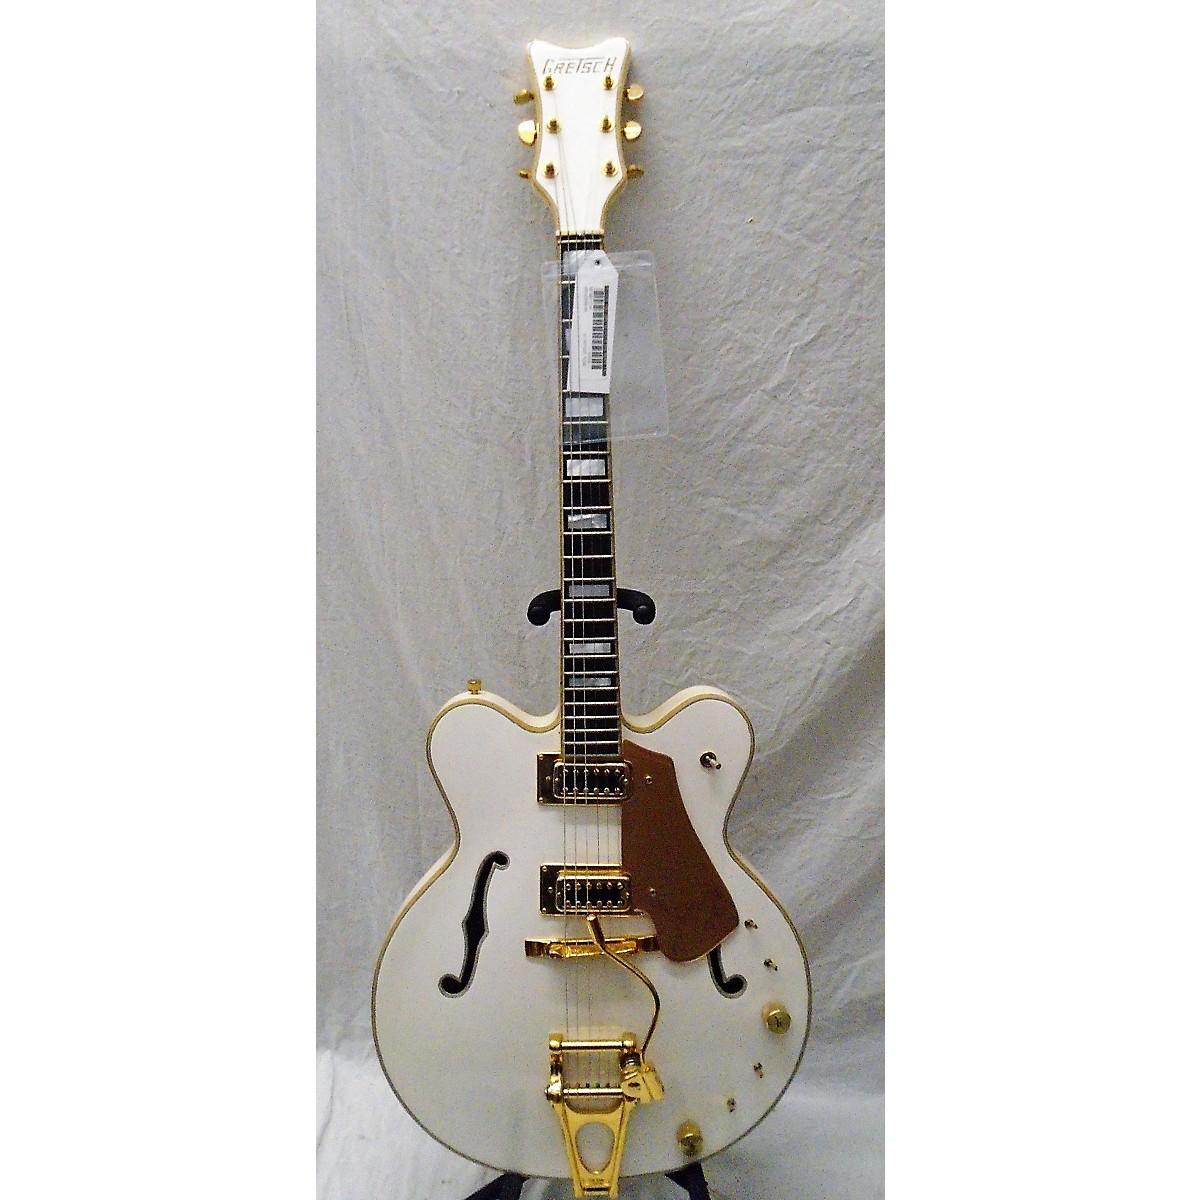 Gretsch Guitars 1981 White Falcon 7595 OHSC Hollow Body Electric Guitar